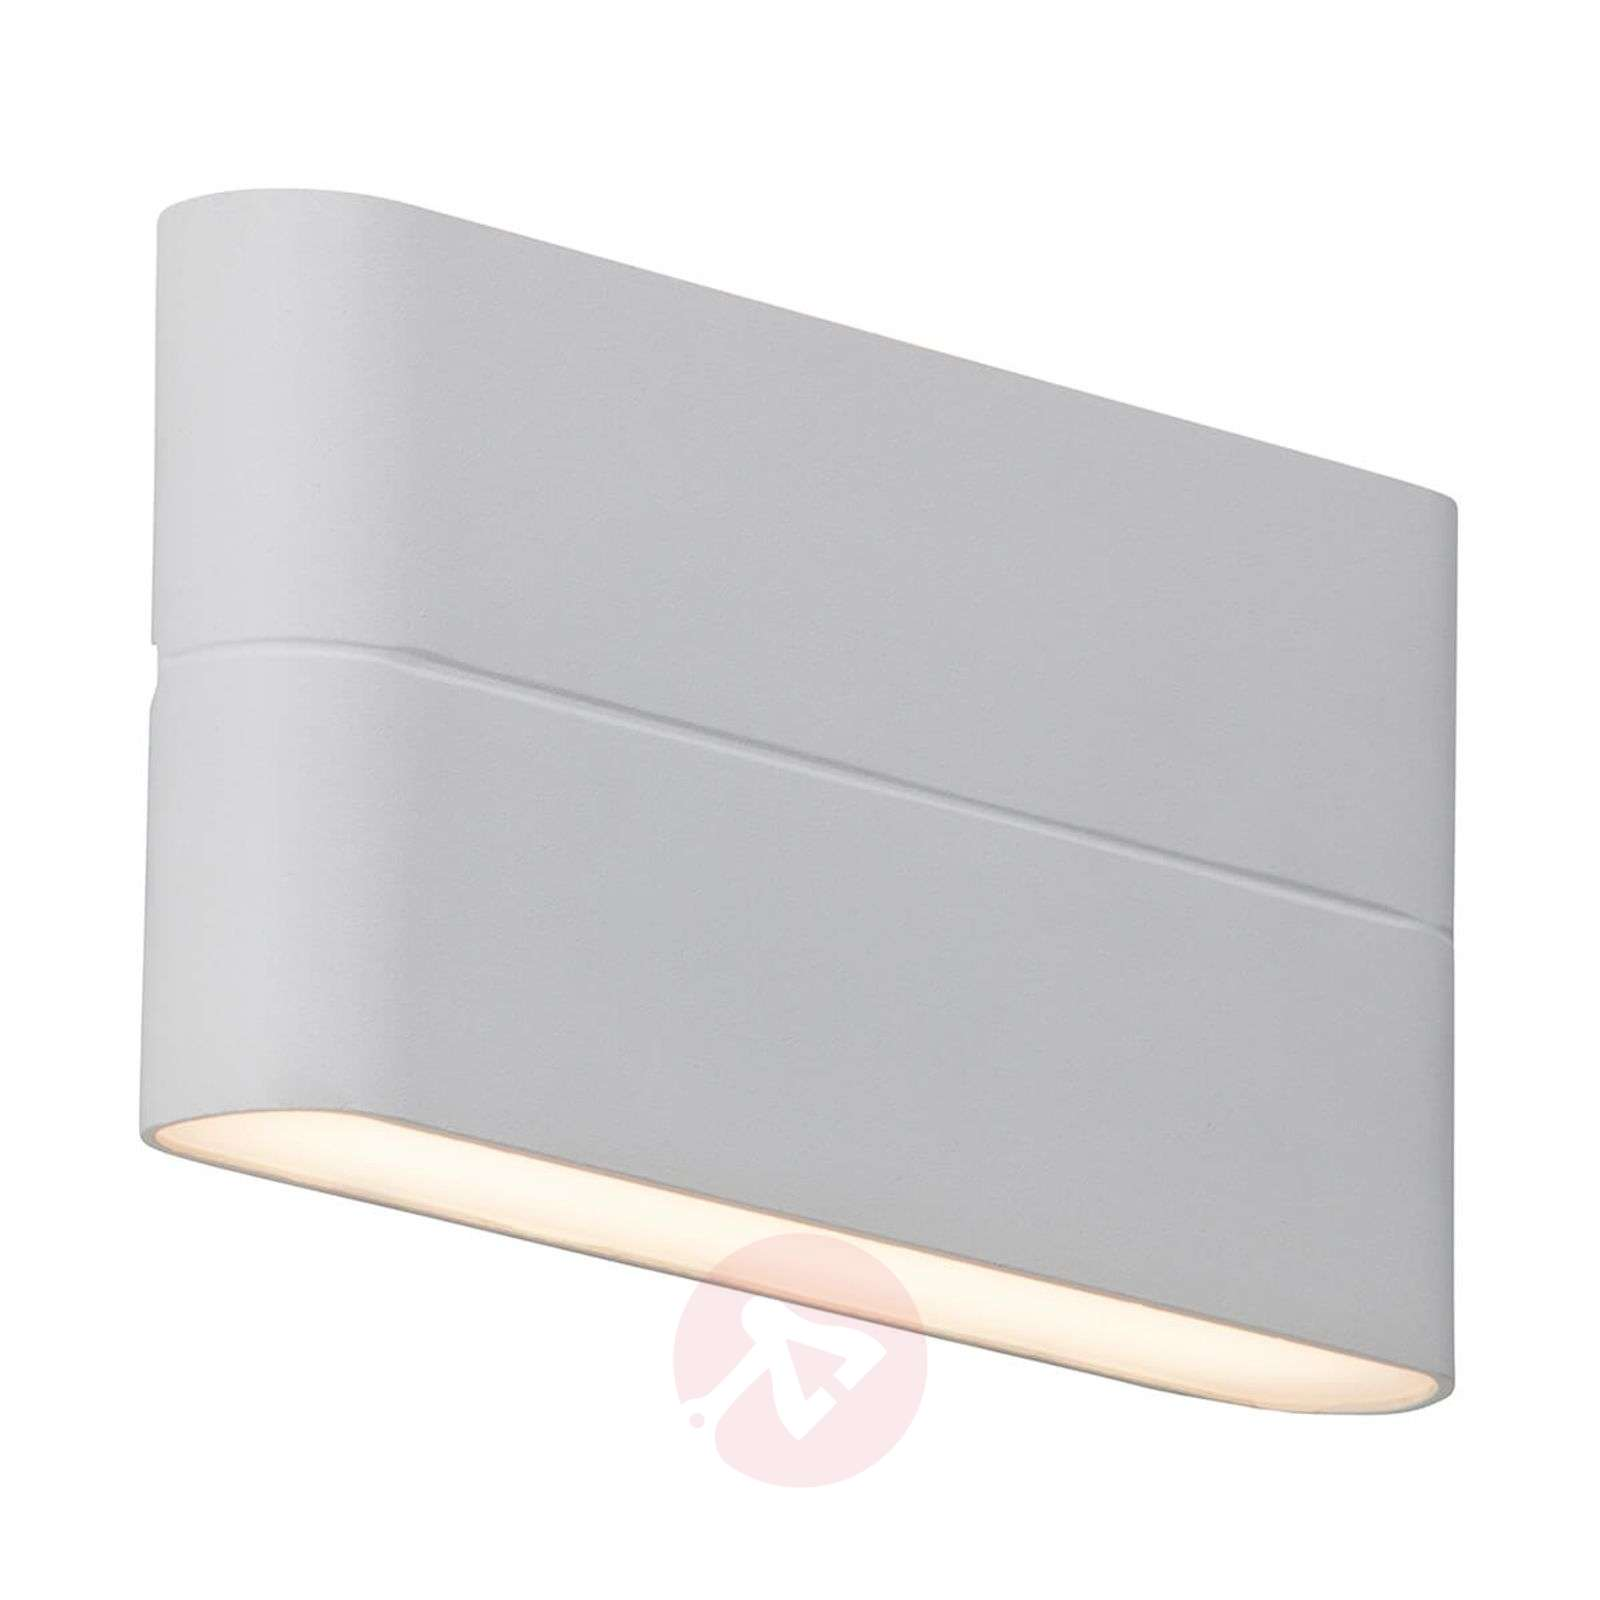 Flat Telesta Led Outdoor Wall Light In White Lights Ie